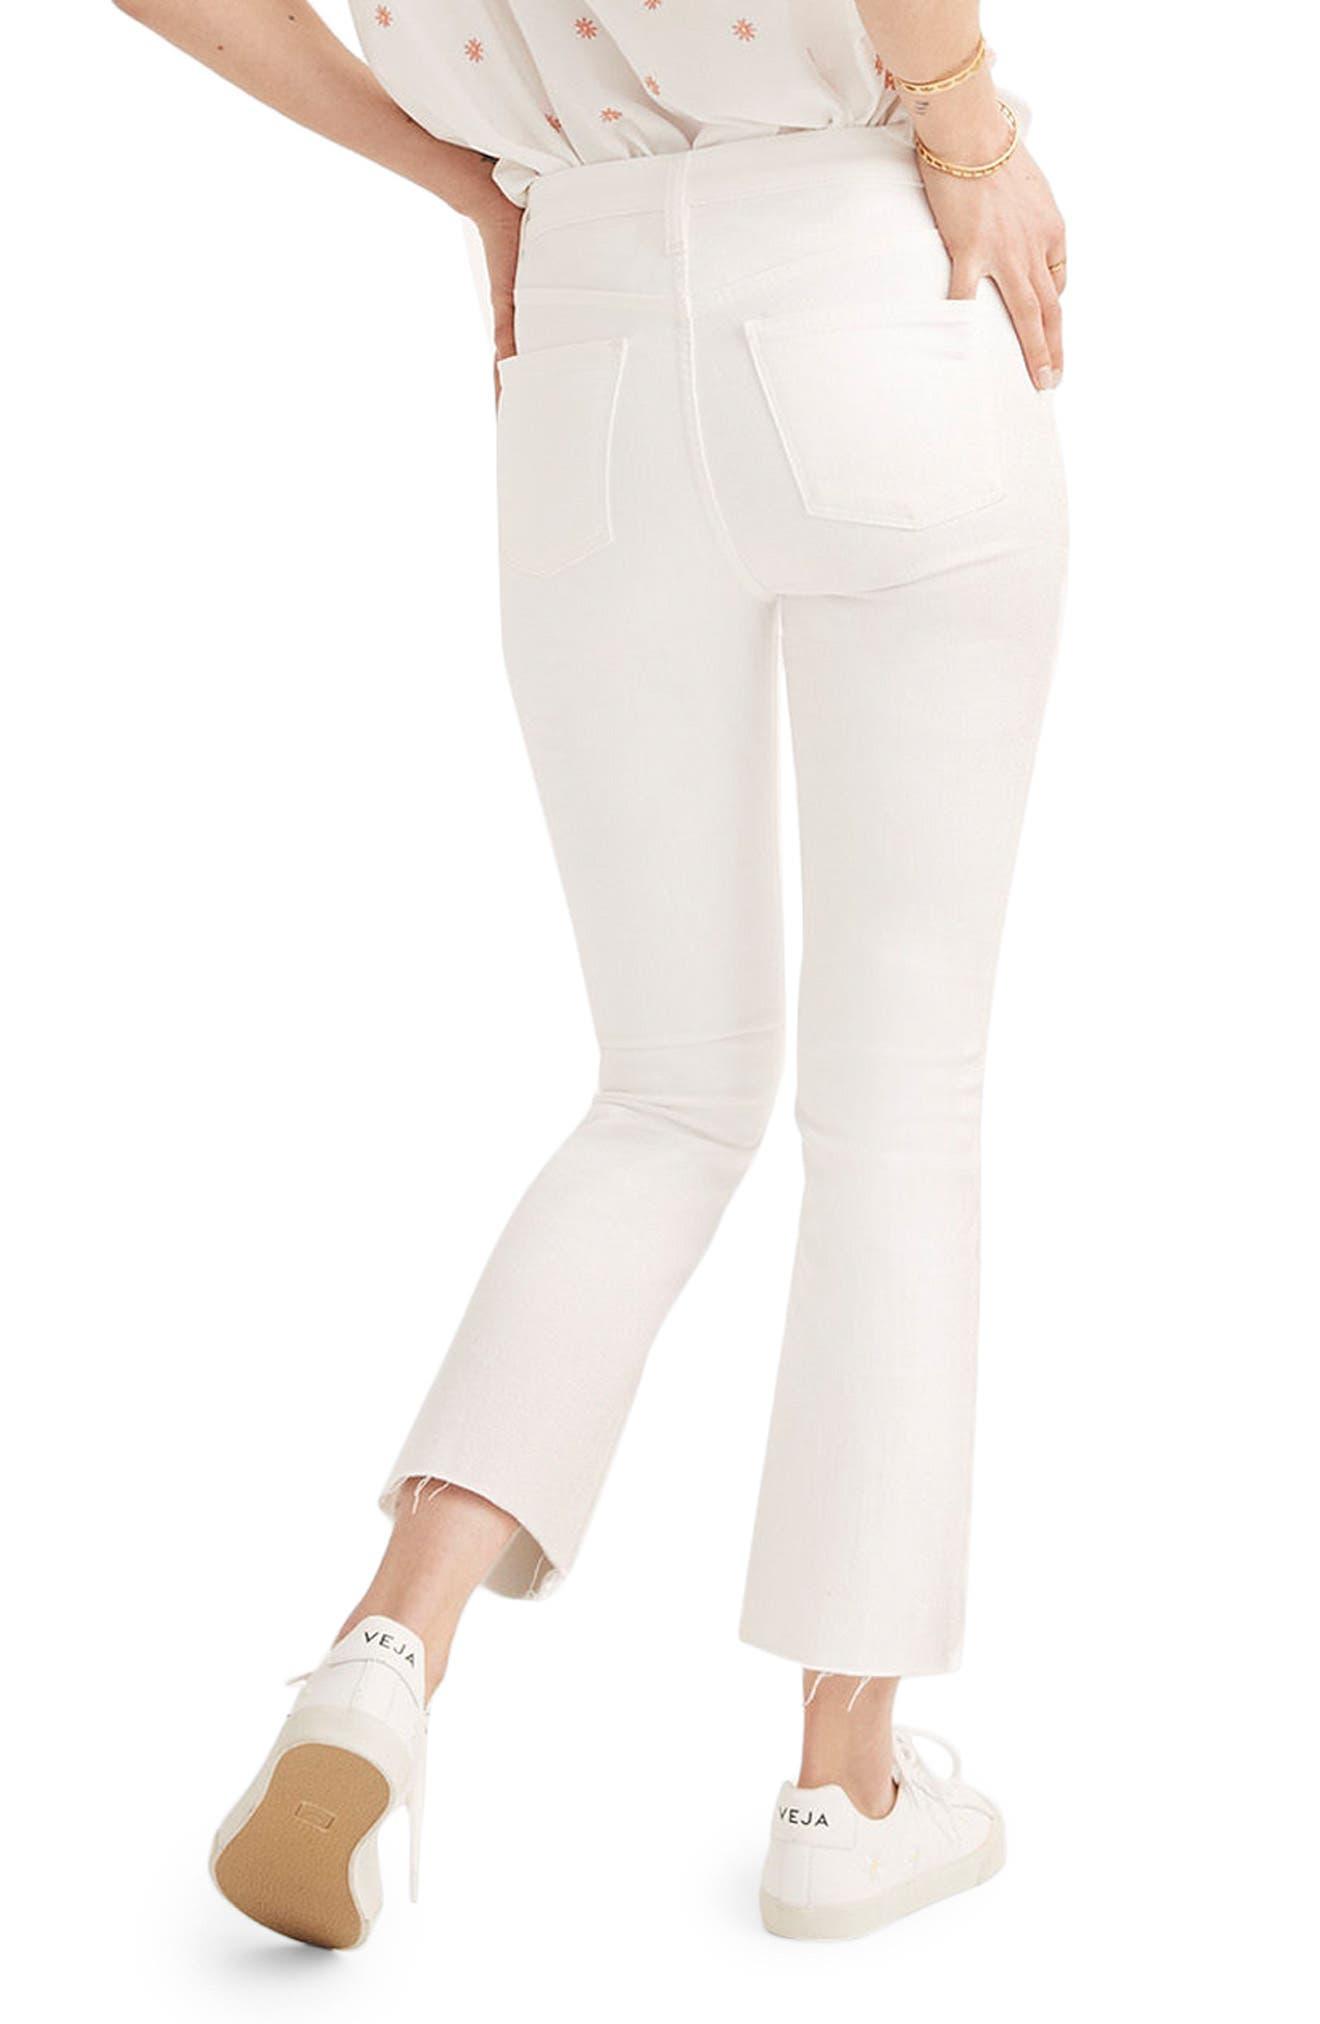 MADEWELL, Cali Raw Edge Demi Boot Jeans, Alternate thumbnail 4, color, PURE WHITE